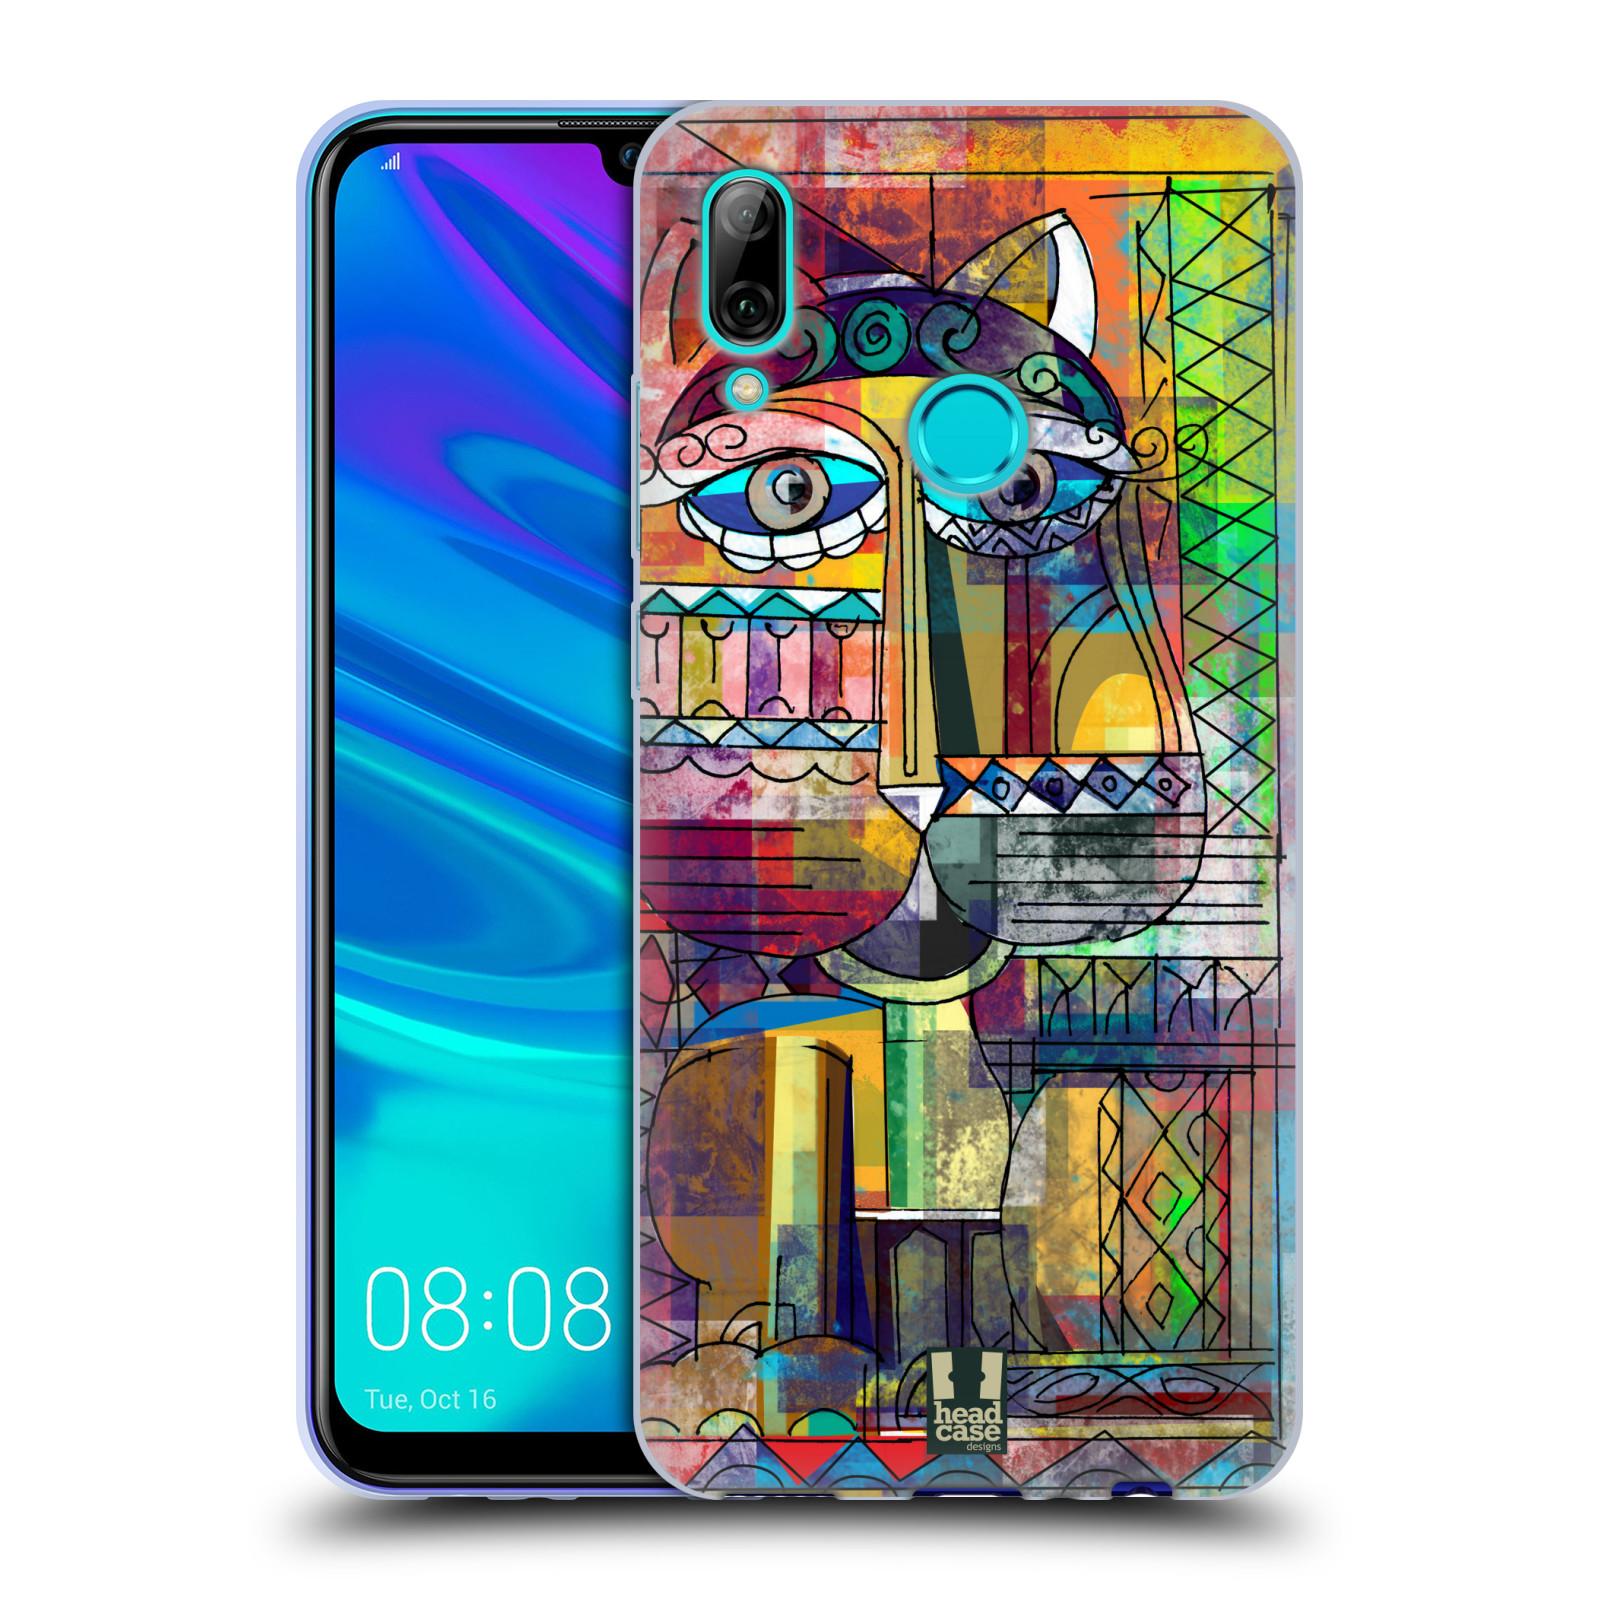 Silikonové pouzdro na mobil Huawei P Smart (2019) - Head Case - AZTEC KORAT